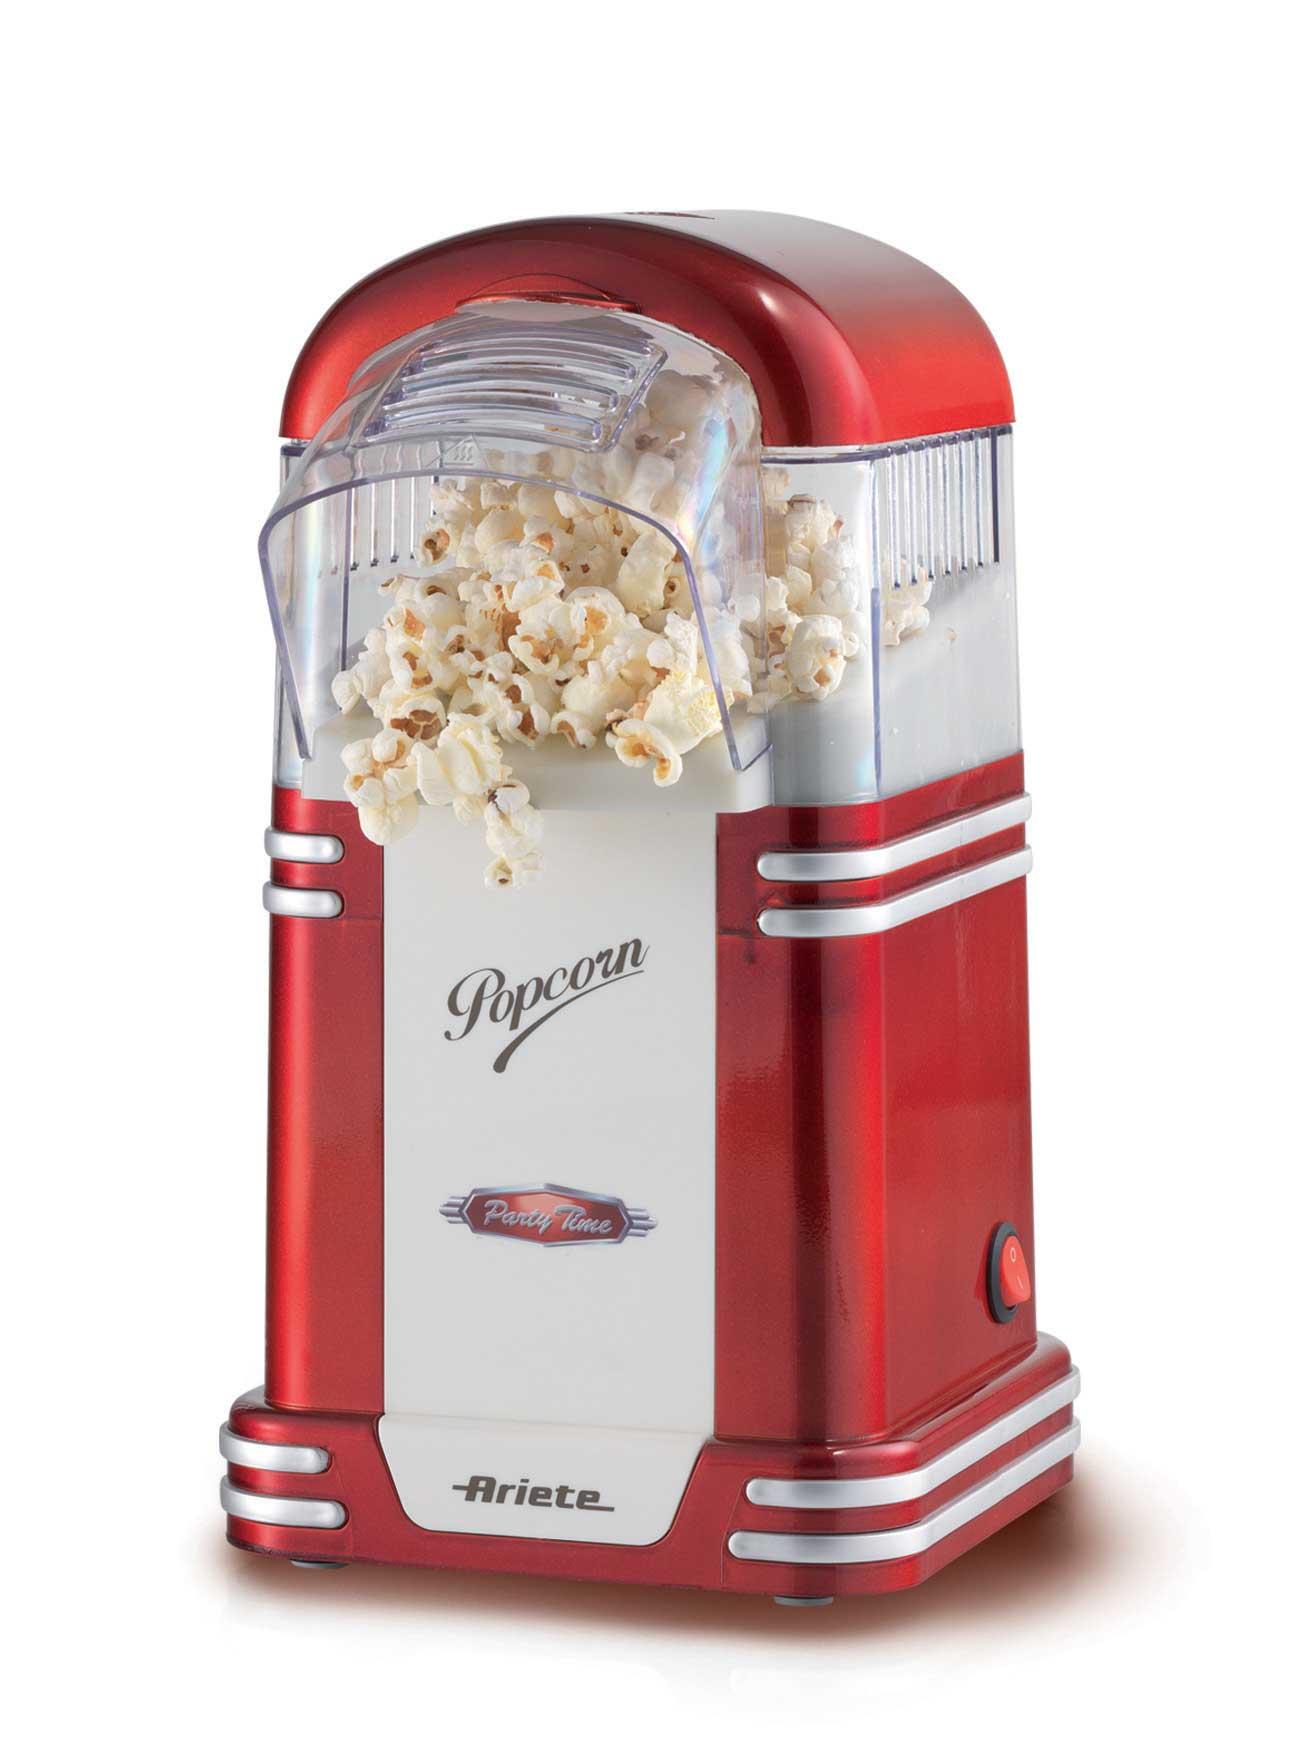 Popcorn Popper Party Time  Ariete